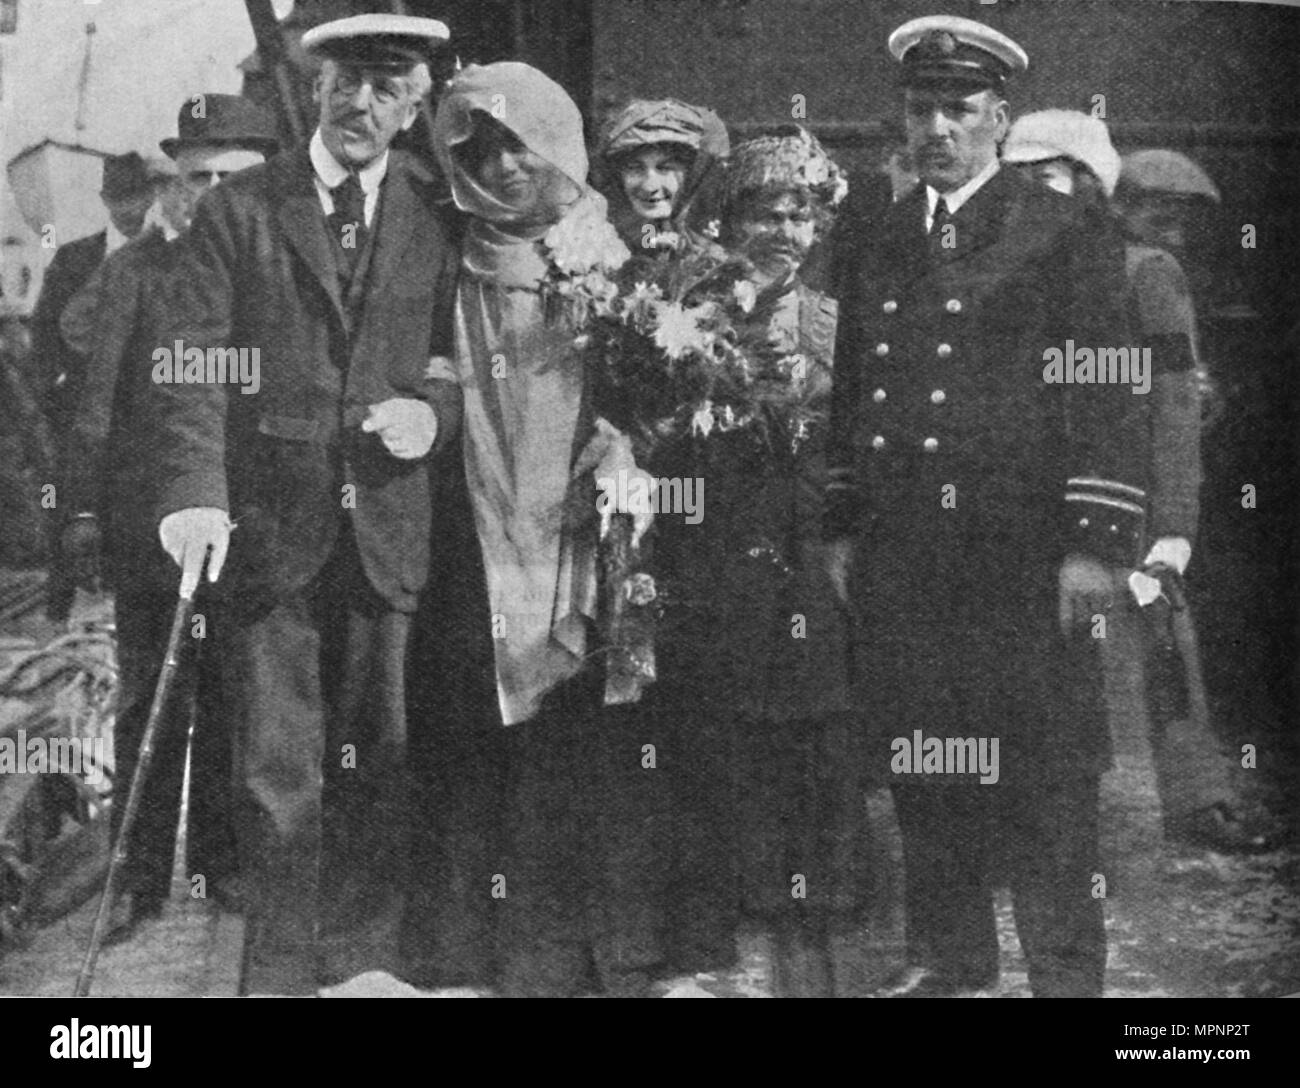 'Sir Squire Bancroft and Madame Sarah Bernhardt', c1925. Artist: Unknown. - Stock Image